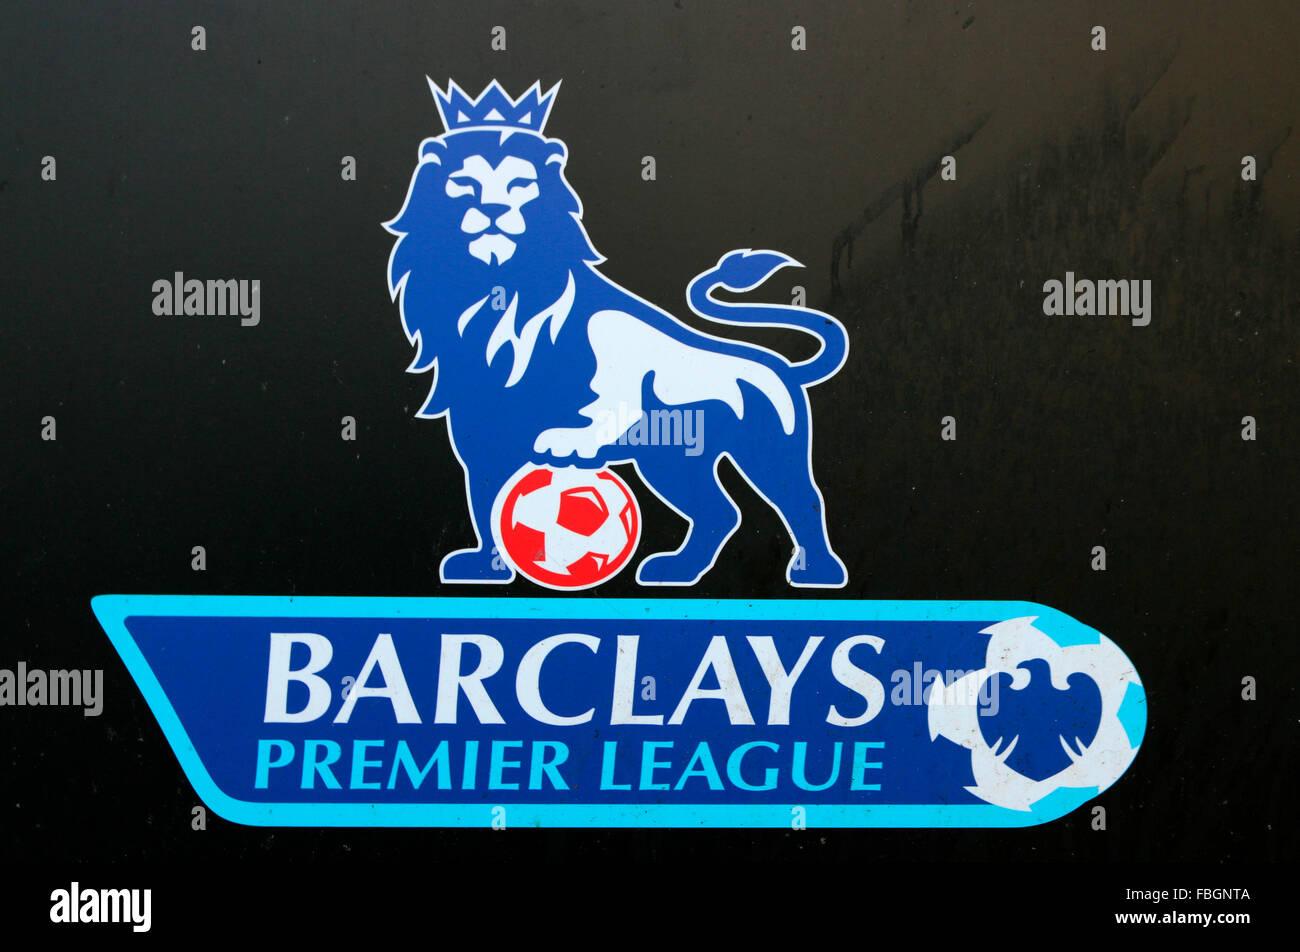 Logo das der Marke 'Barclays Premiere League', de Berlín. Imagen De Stock